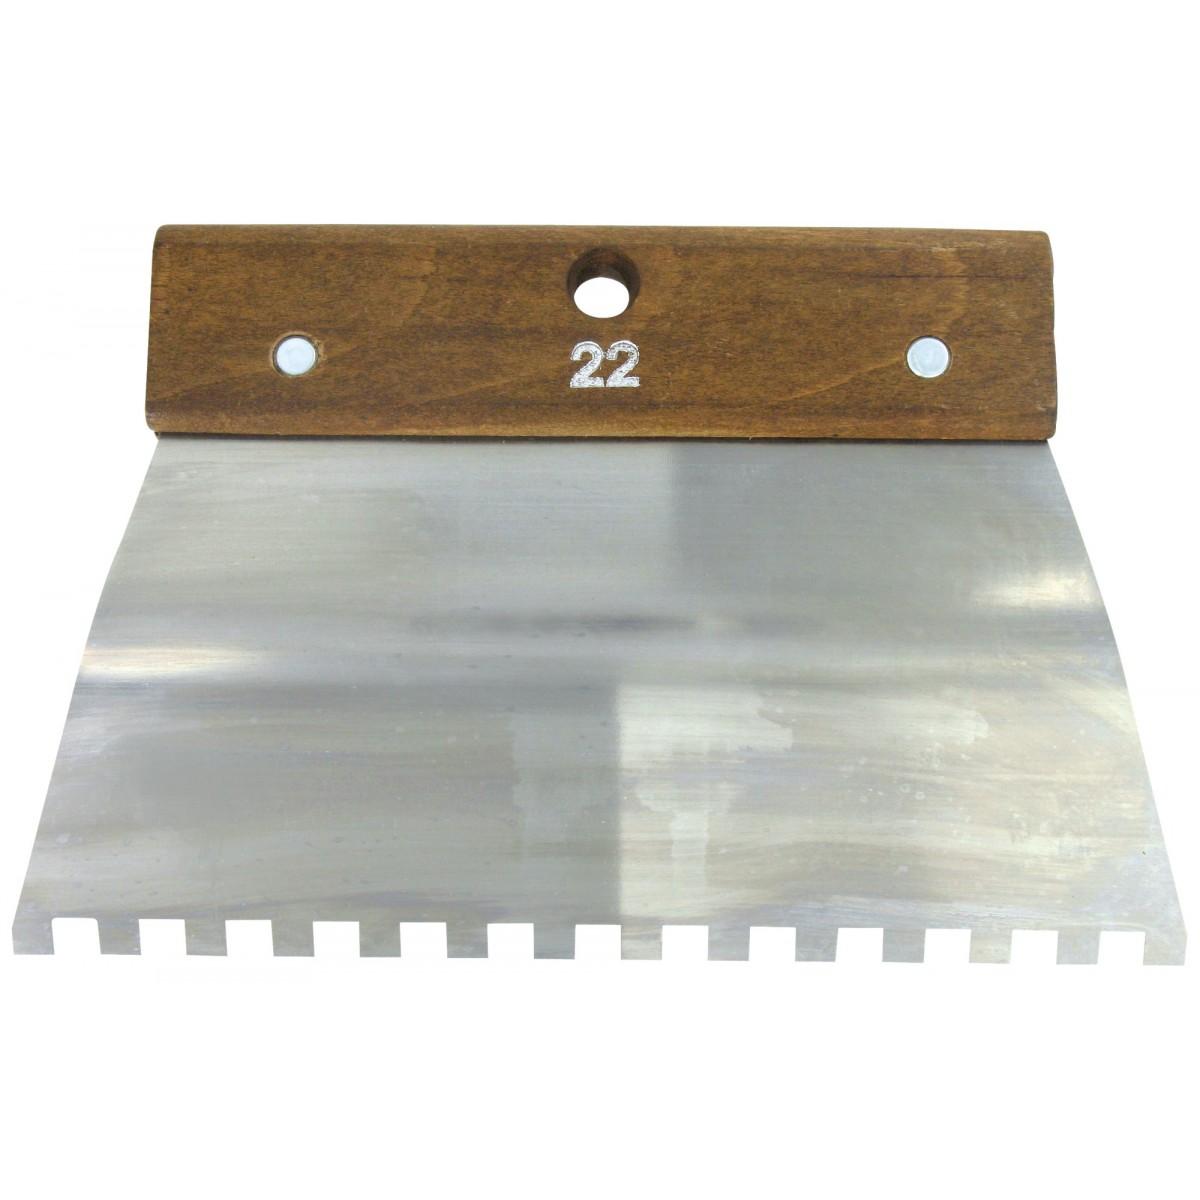 Peigne acier cambre Outibat - Denture carrée 8 x 8 mm - Dimensions 220 mm